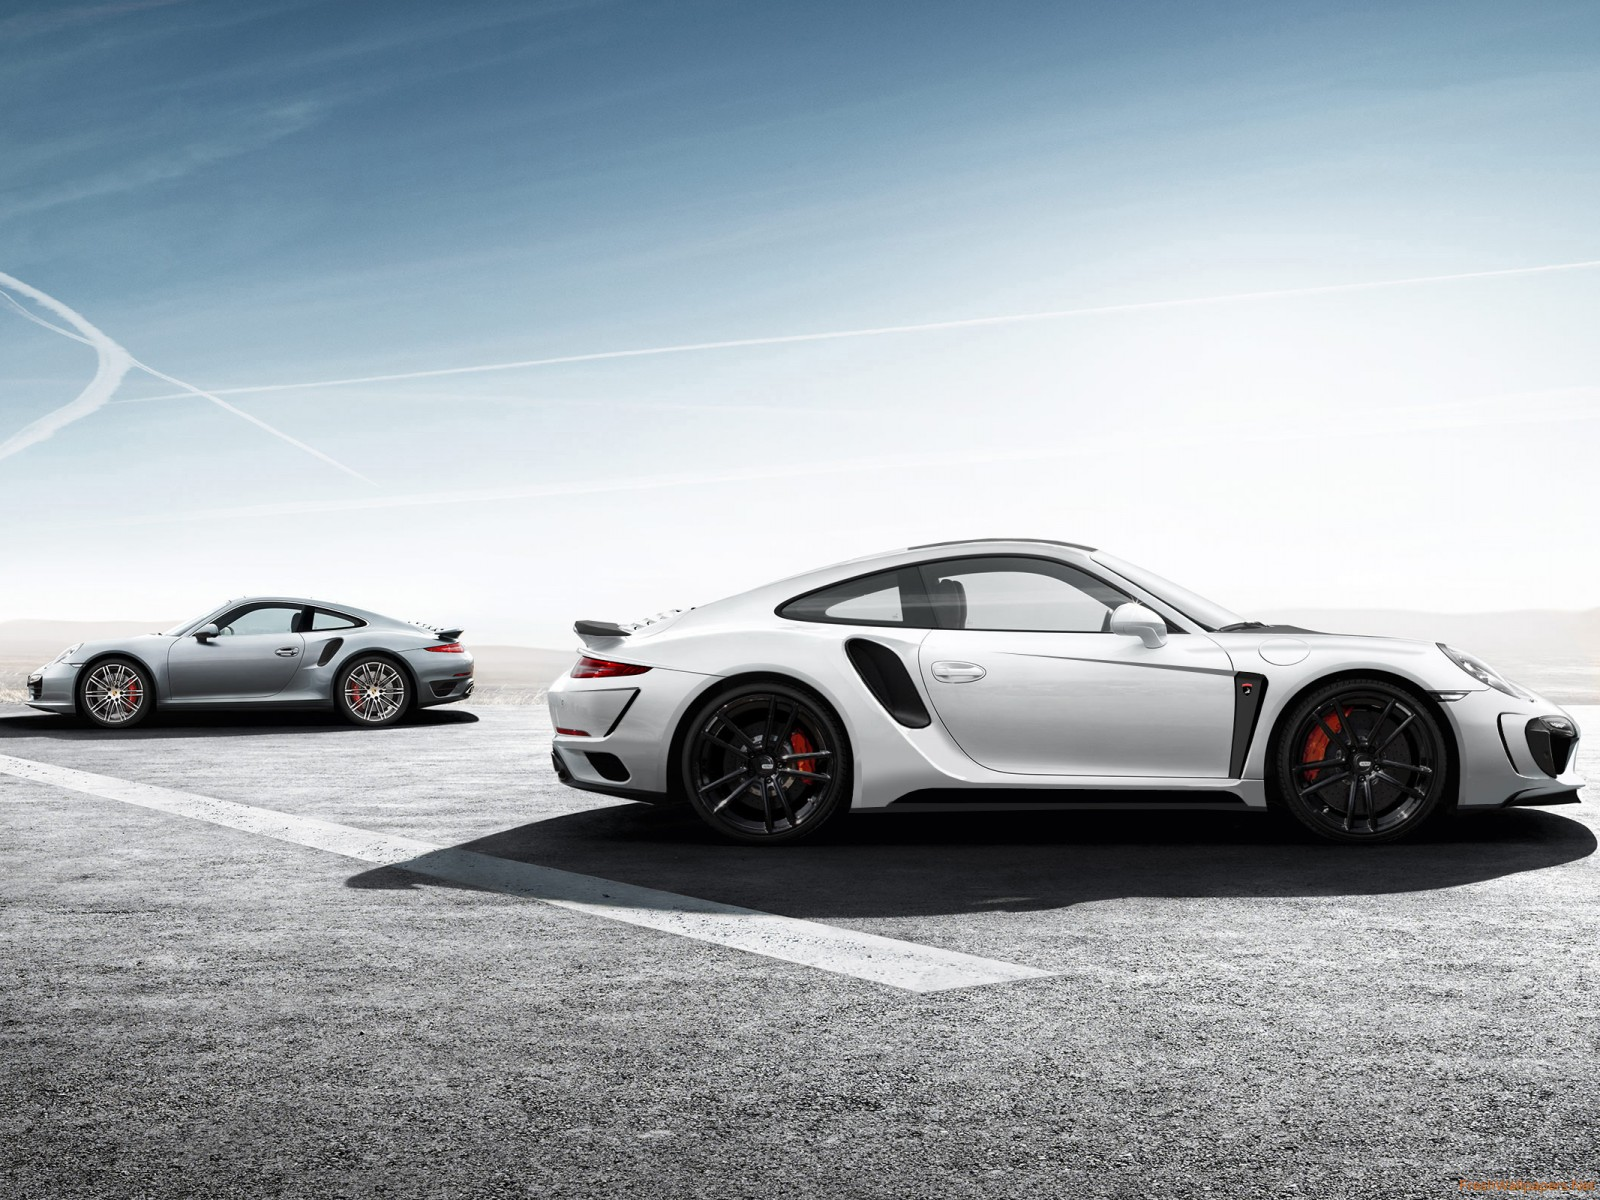 Pc Porsche 911 Turbo S Wallpapers Mercia Bonsul